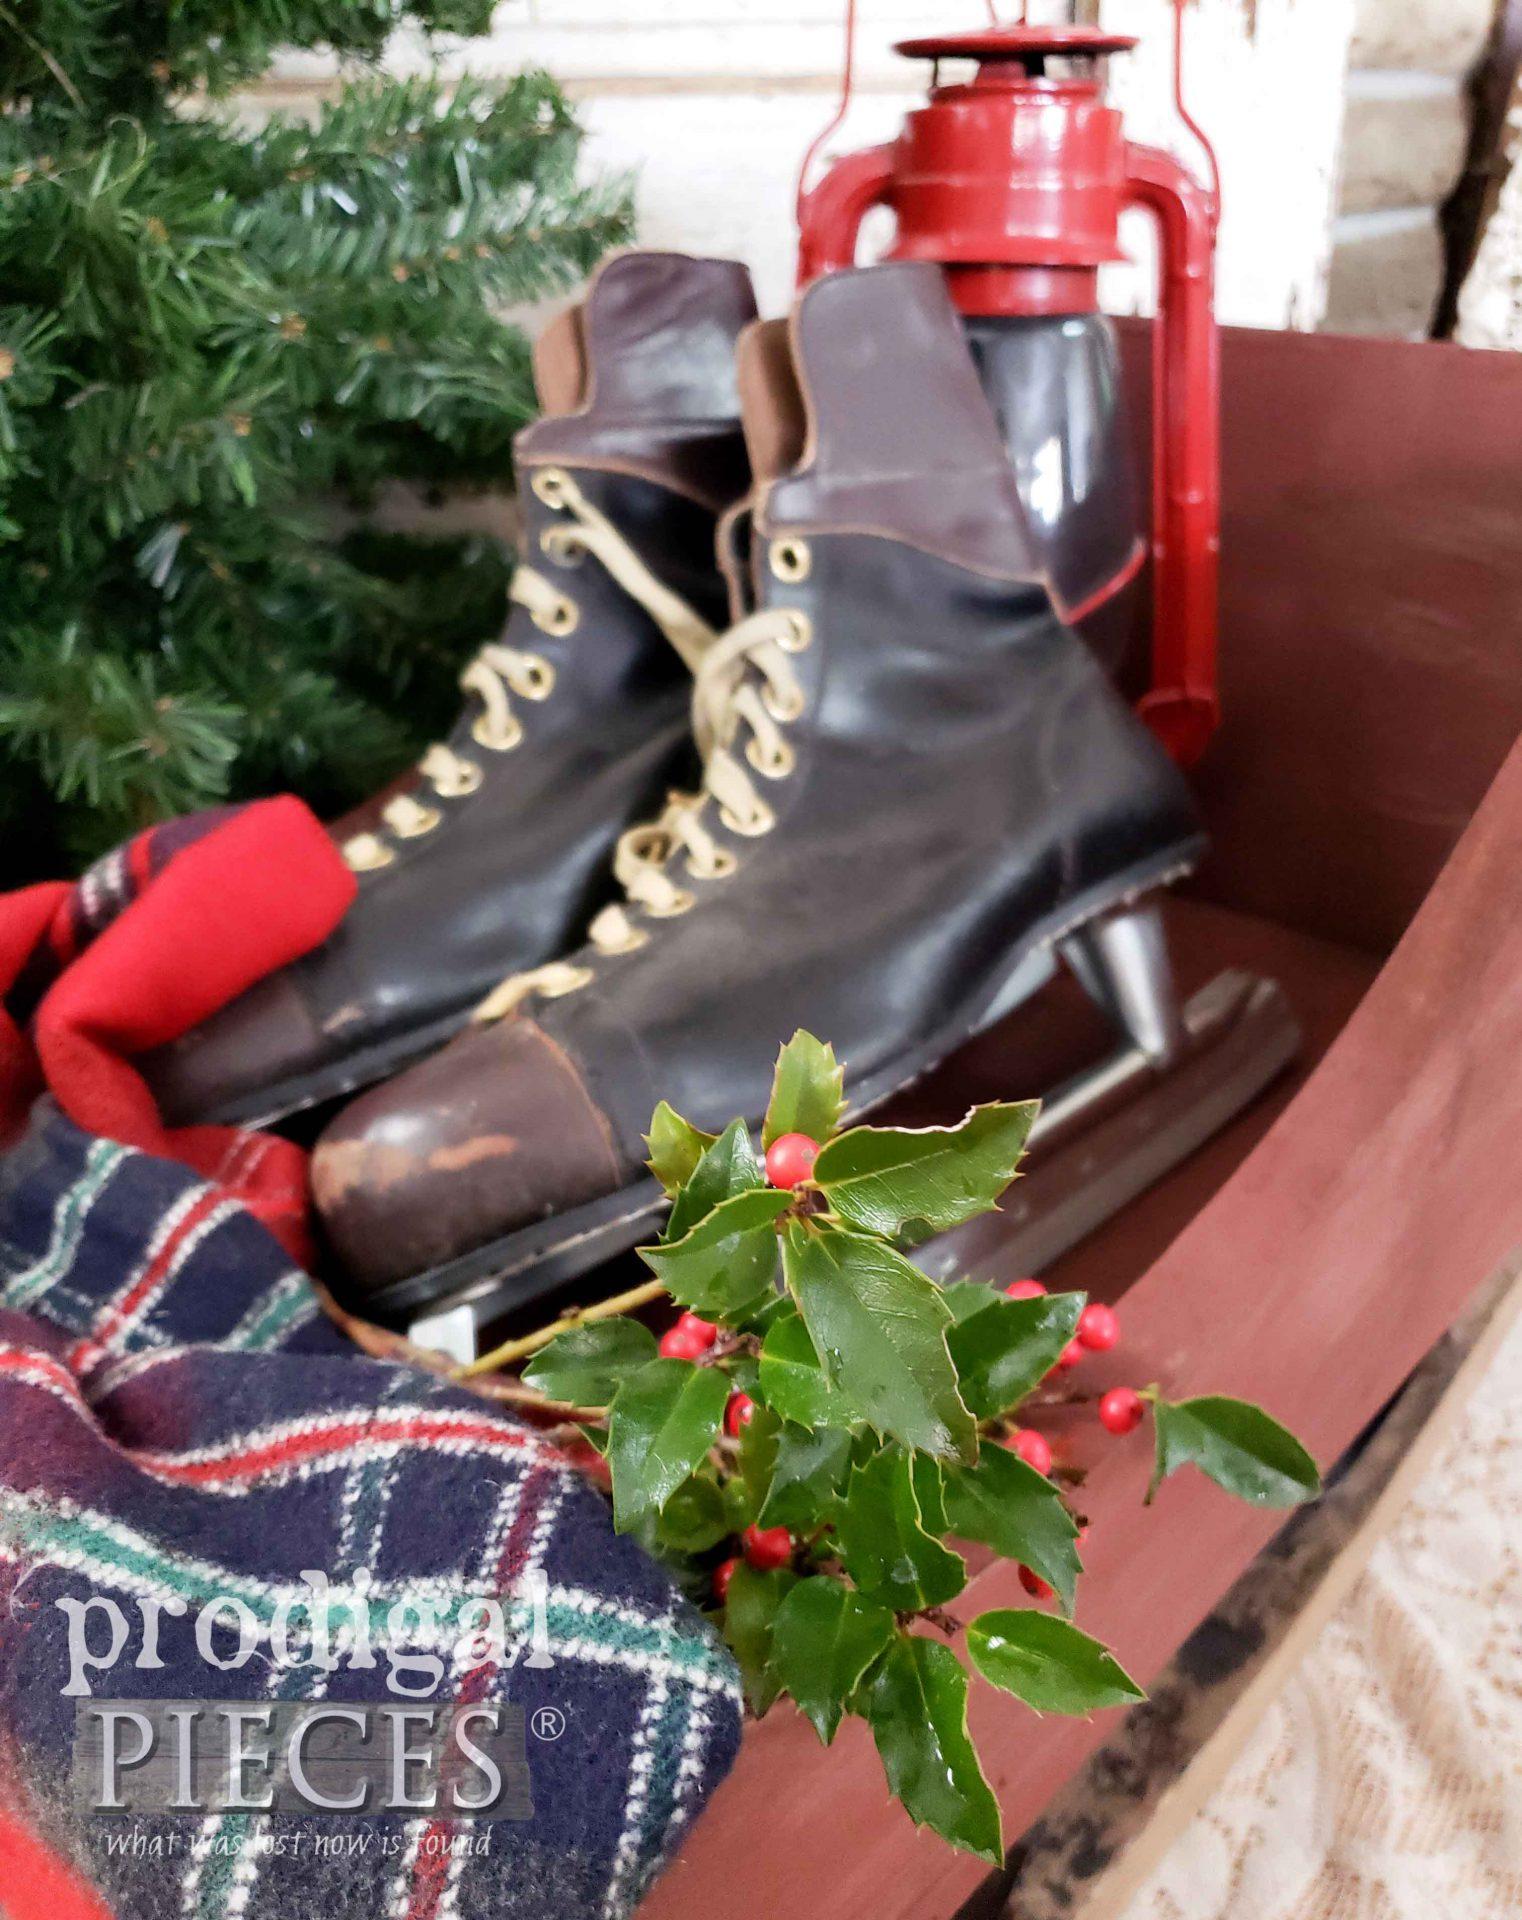 DIY Farmhouse Christmas Decor by Larissa of Prodigal Pieces | prodigalpieces.com #prodigalpieces #farmhouse #christmas #vintage